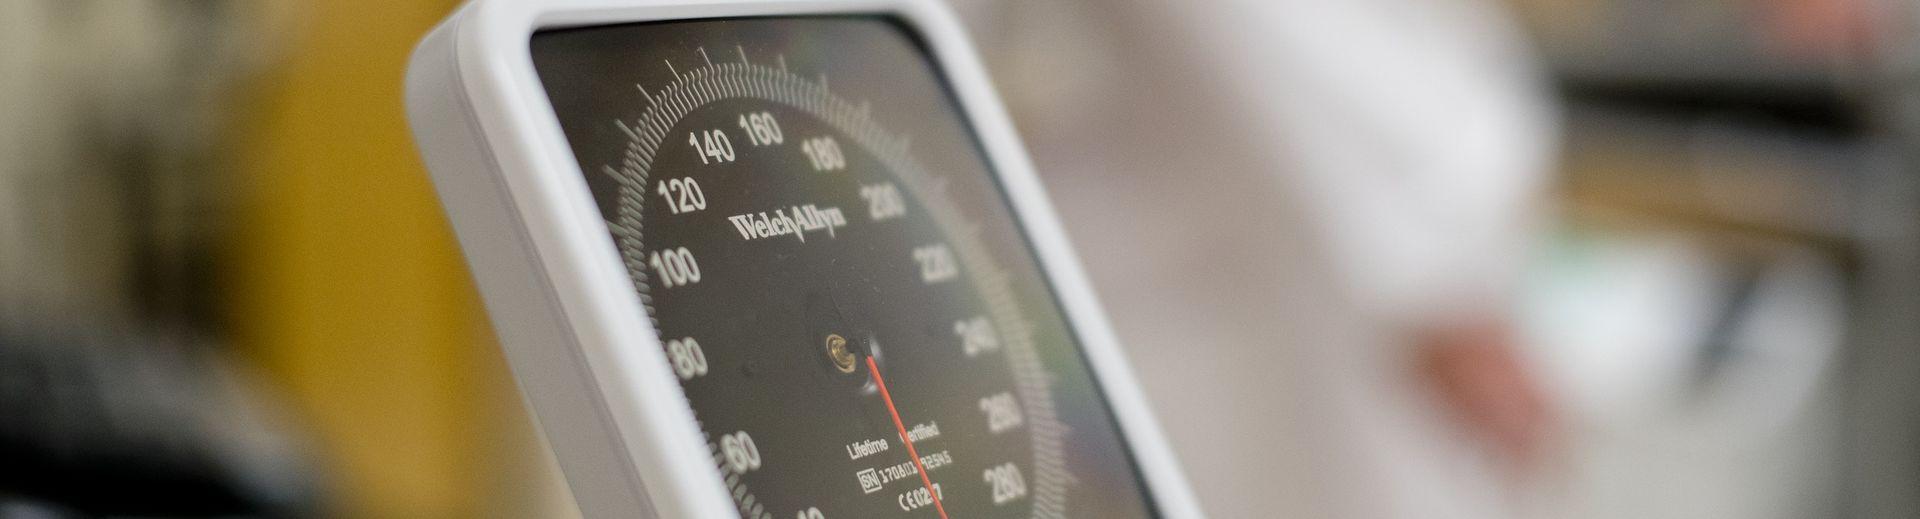 A blood pressure gauge